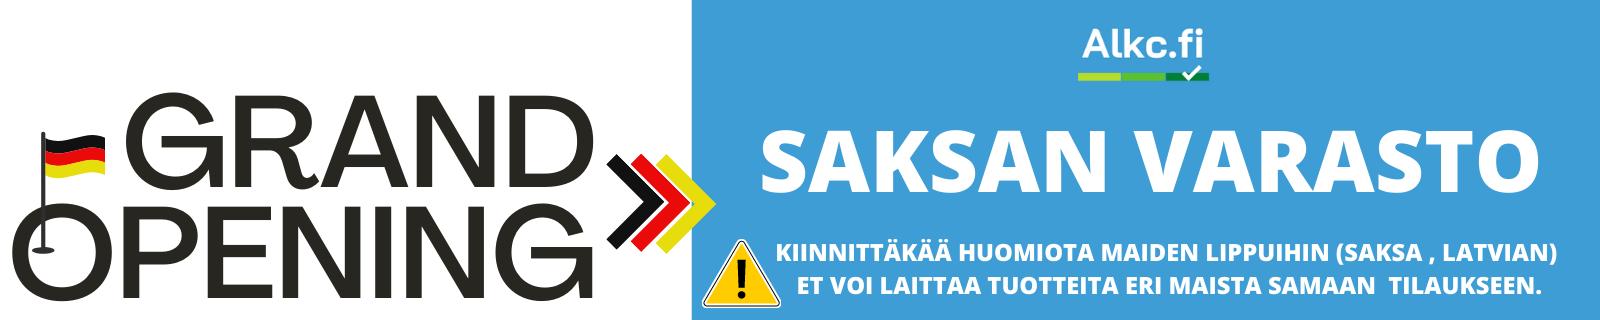 Copy of Alkc bannerid